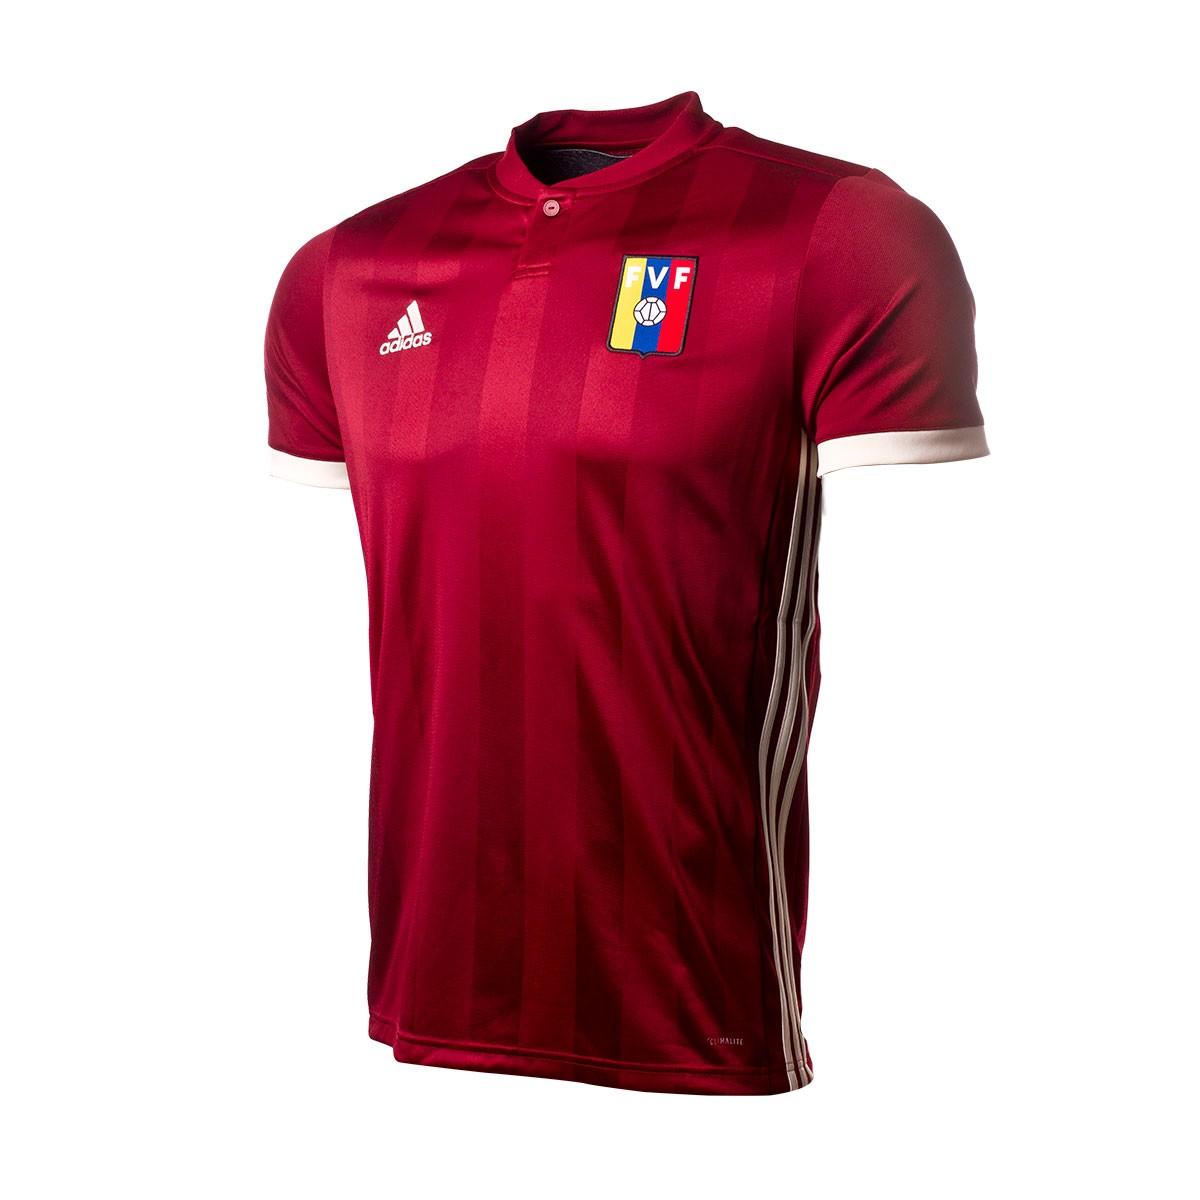 Playera adidas Venezuela Primera Equipación 2017-2018 Collegiate  burgundy-Cram white - Soloporteros es ahora Fútbol Emotion 312ccfe127e